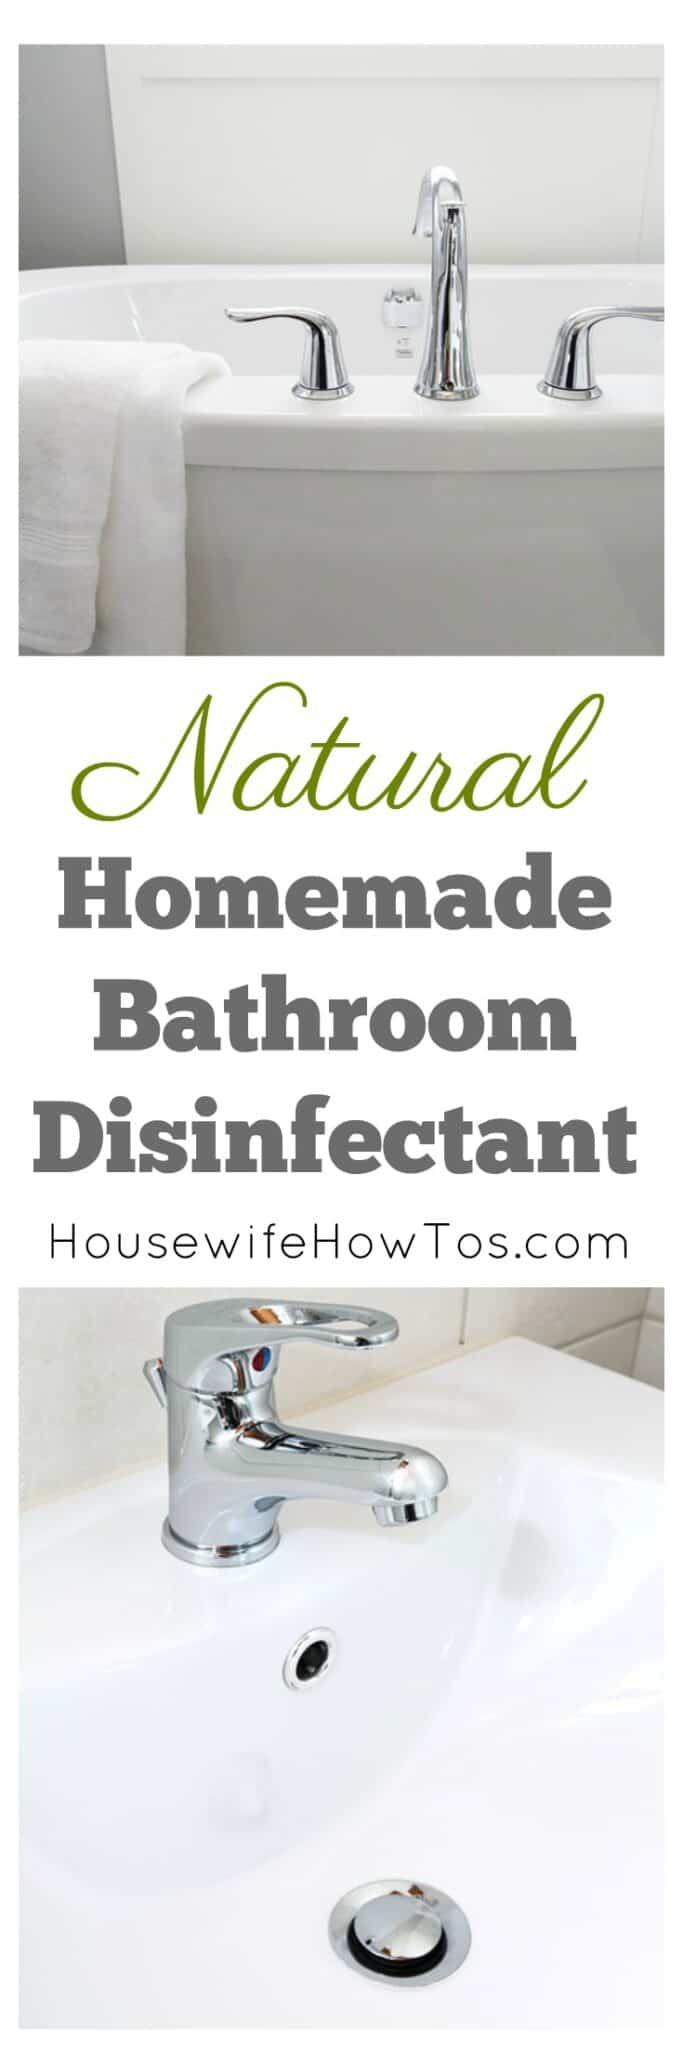 Homemade Bathroom Disinfectant Spray And Scrub